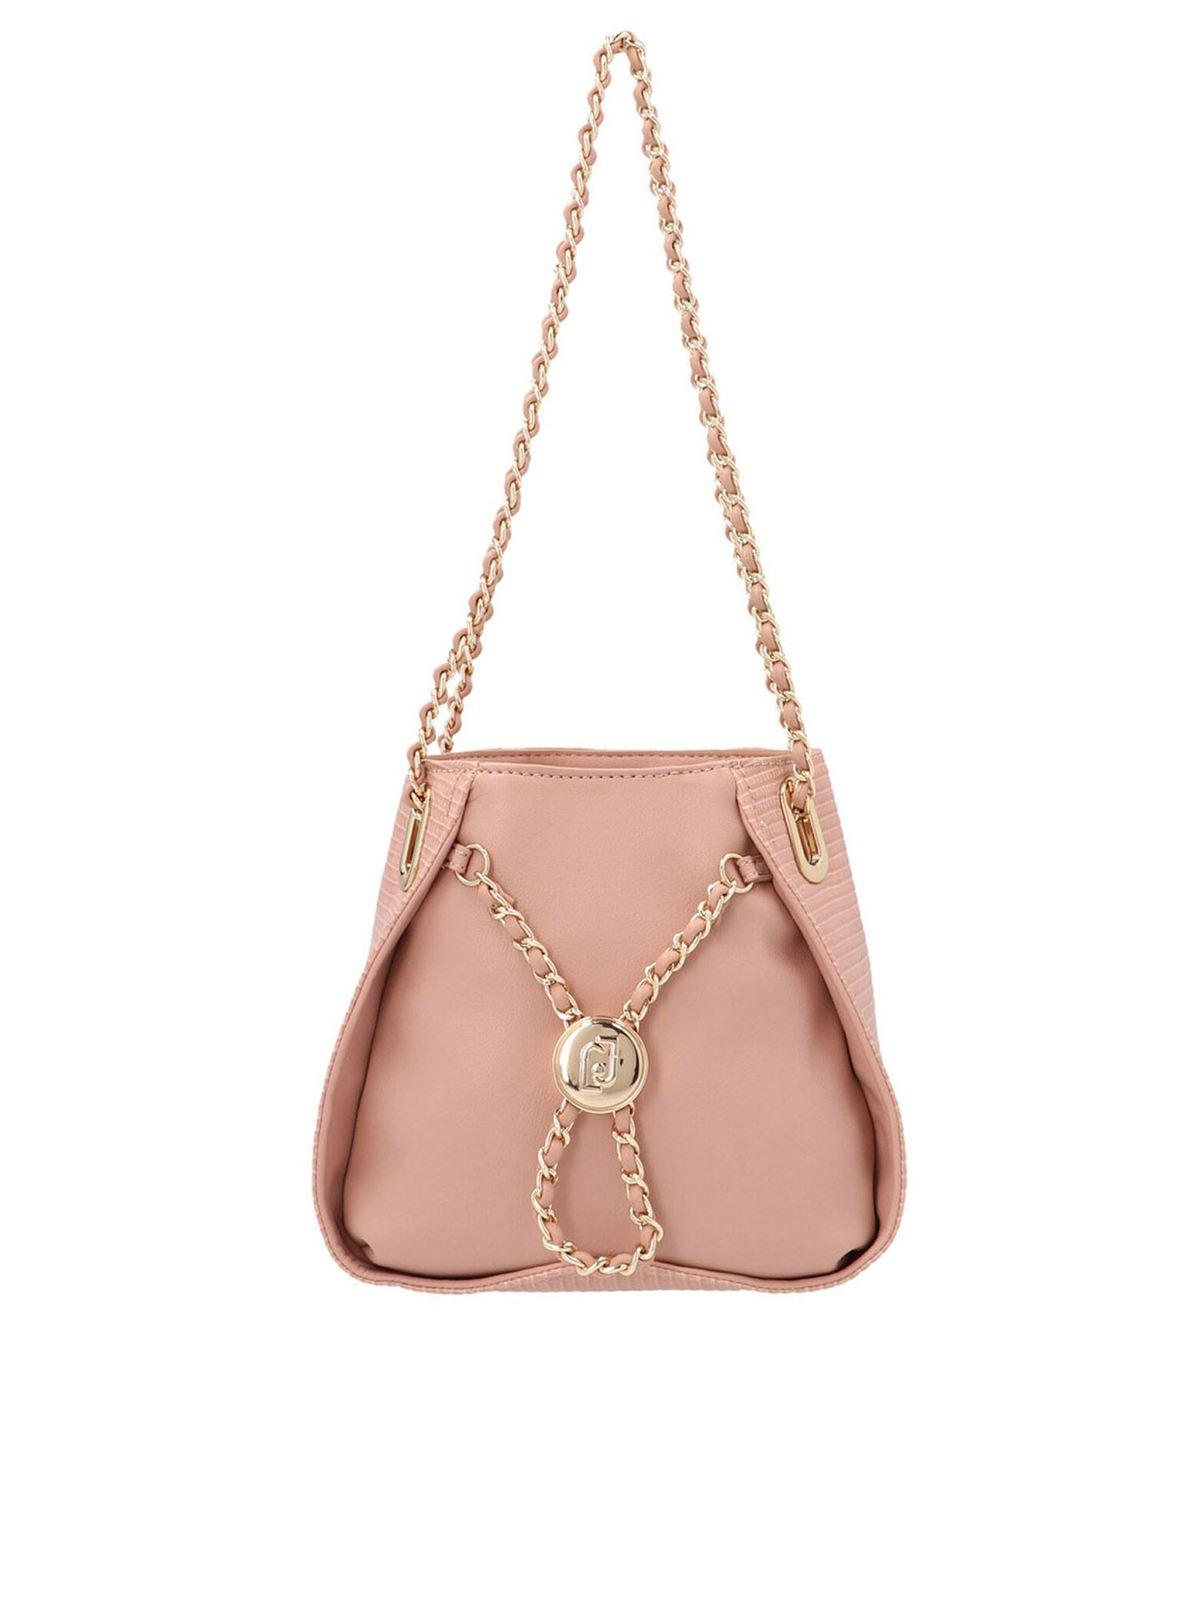 Liu •jo JEWEL CHAIN SHOULDER BAG IN PINK